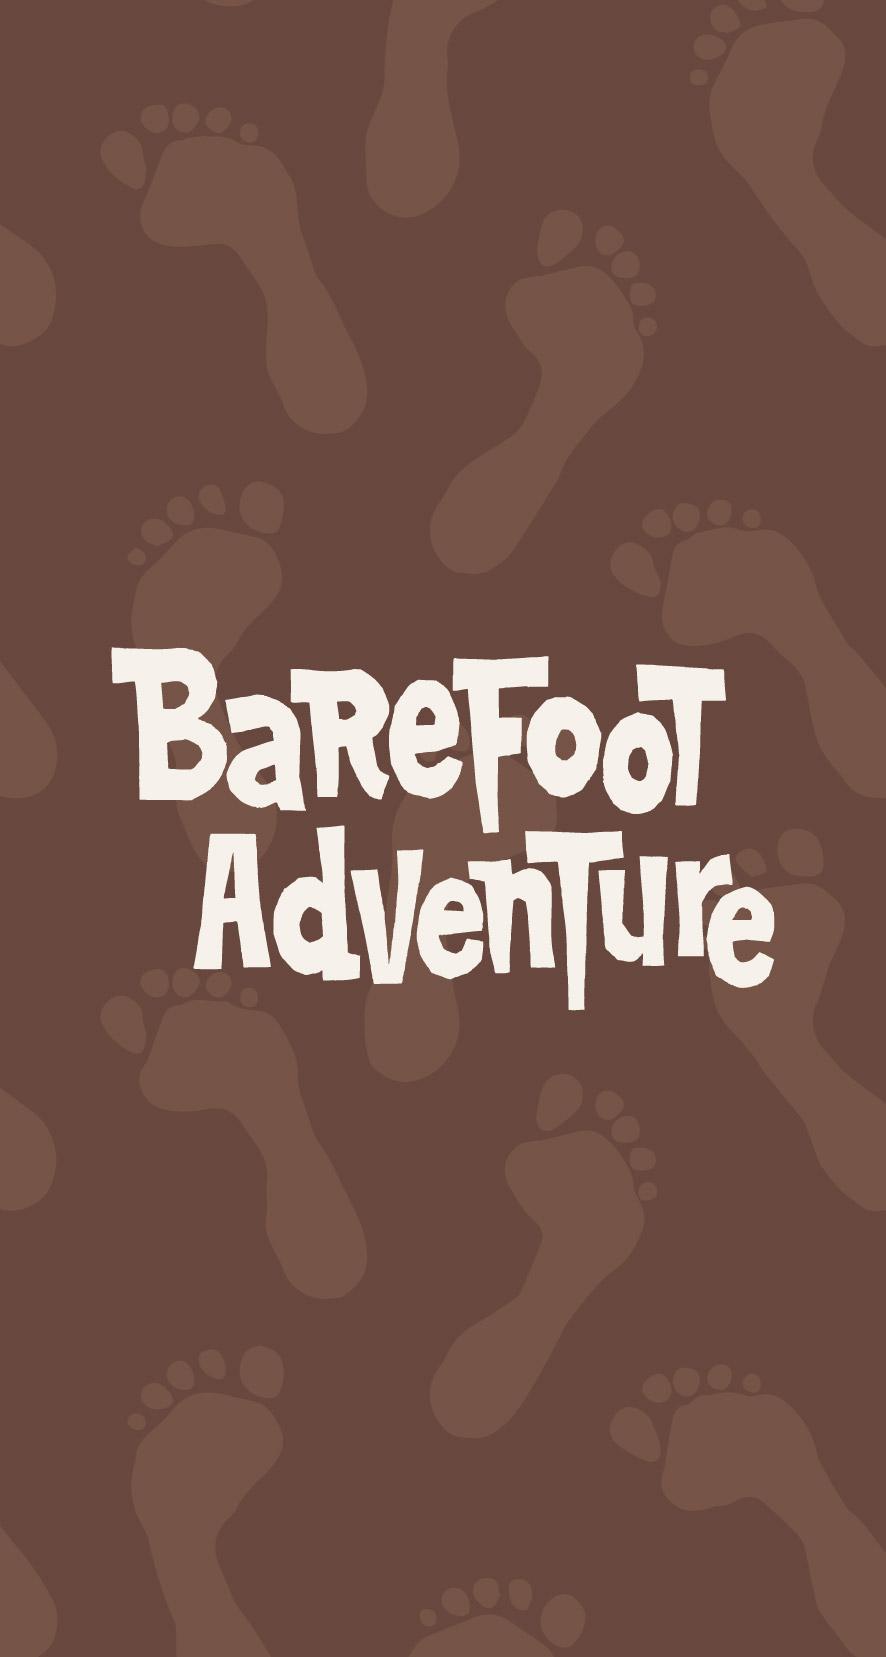 Barefoot adventure  1960